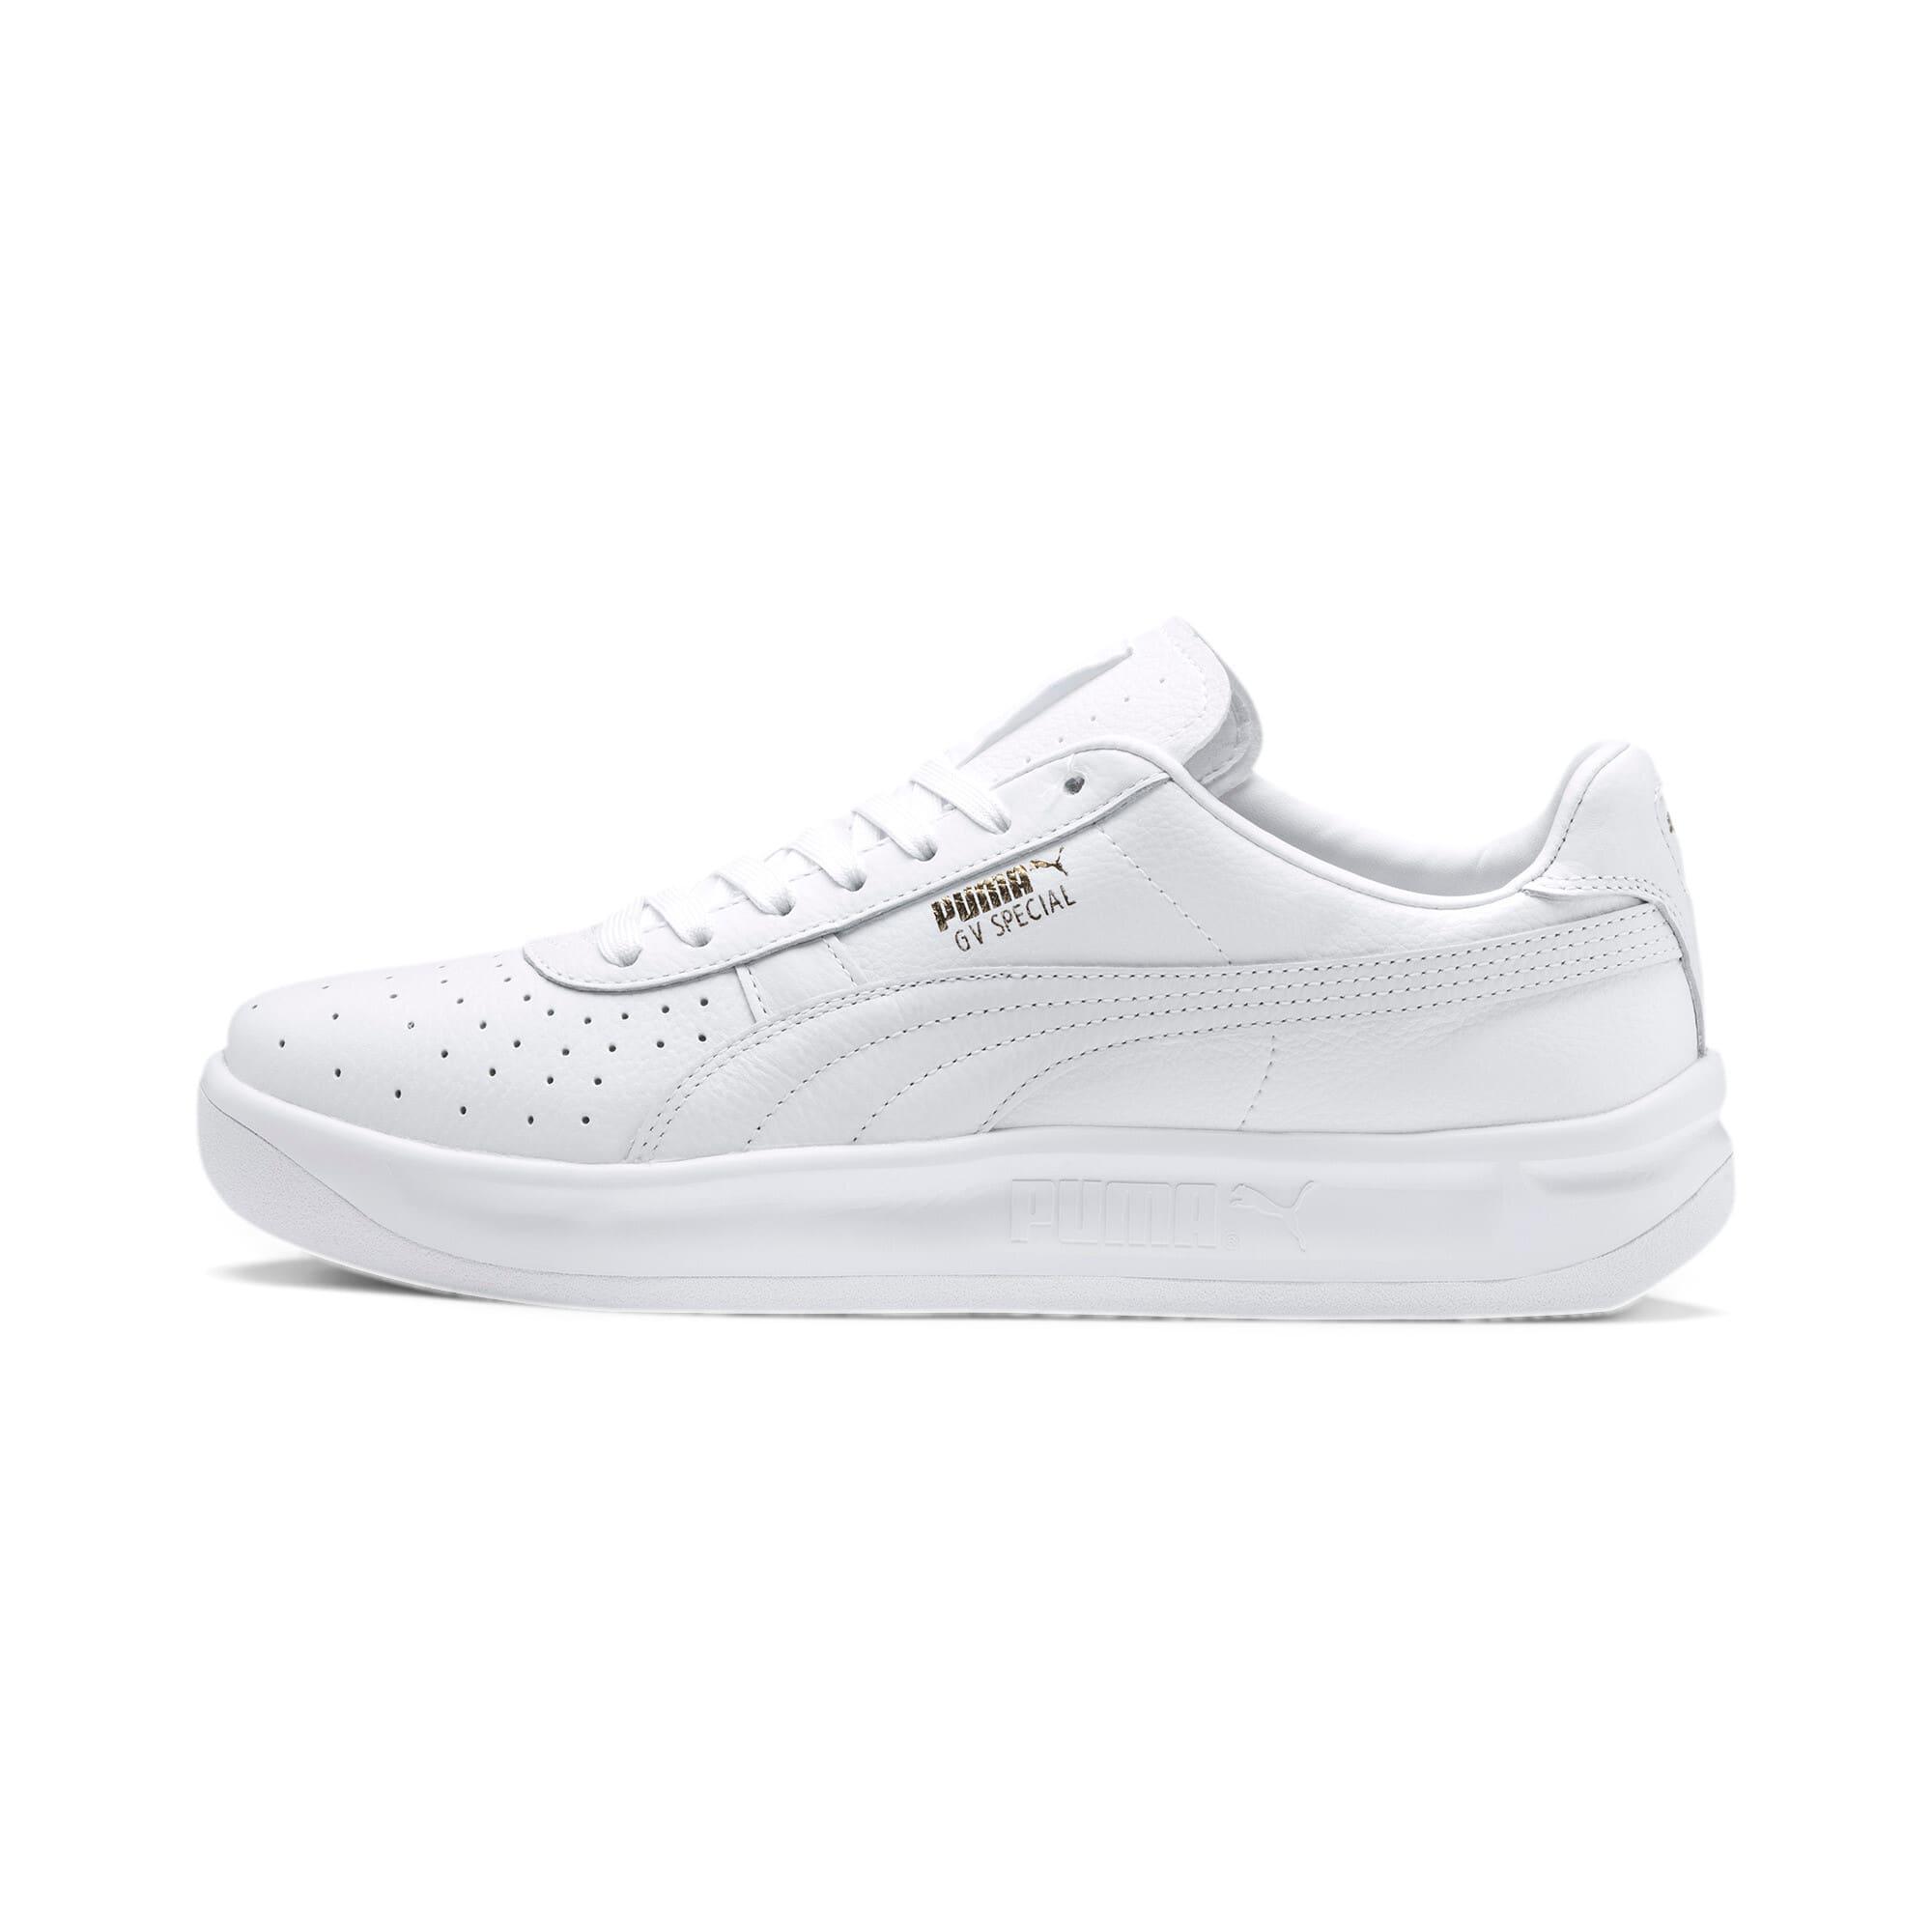 Thumbnail 1 of GV Special+ Sneakers, Puma White-Puma White, medium